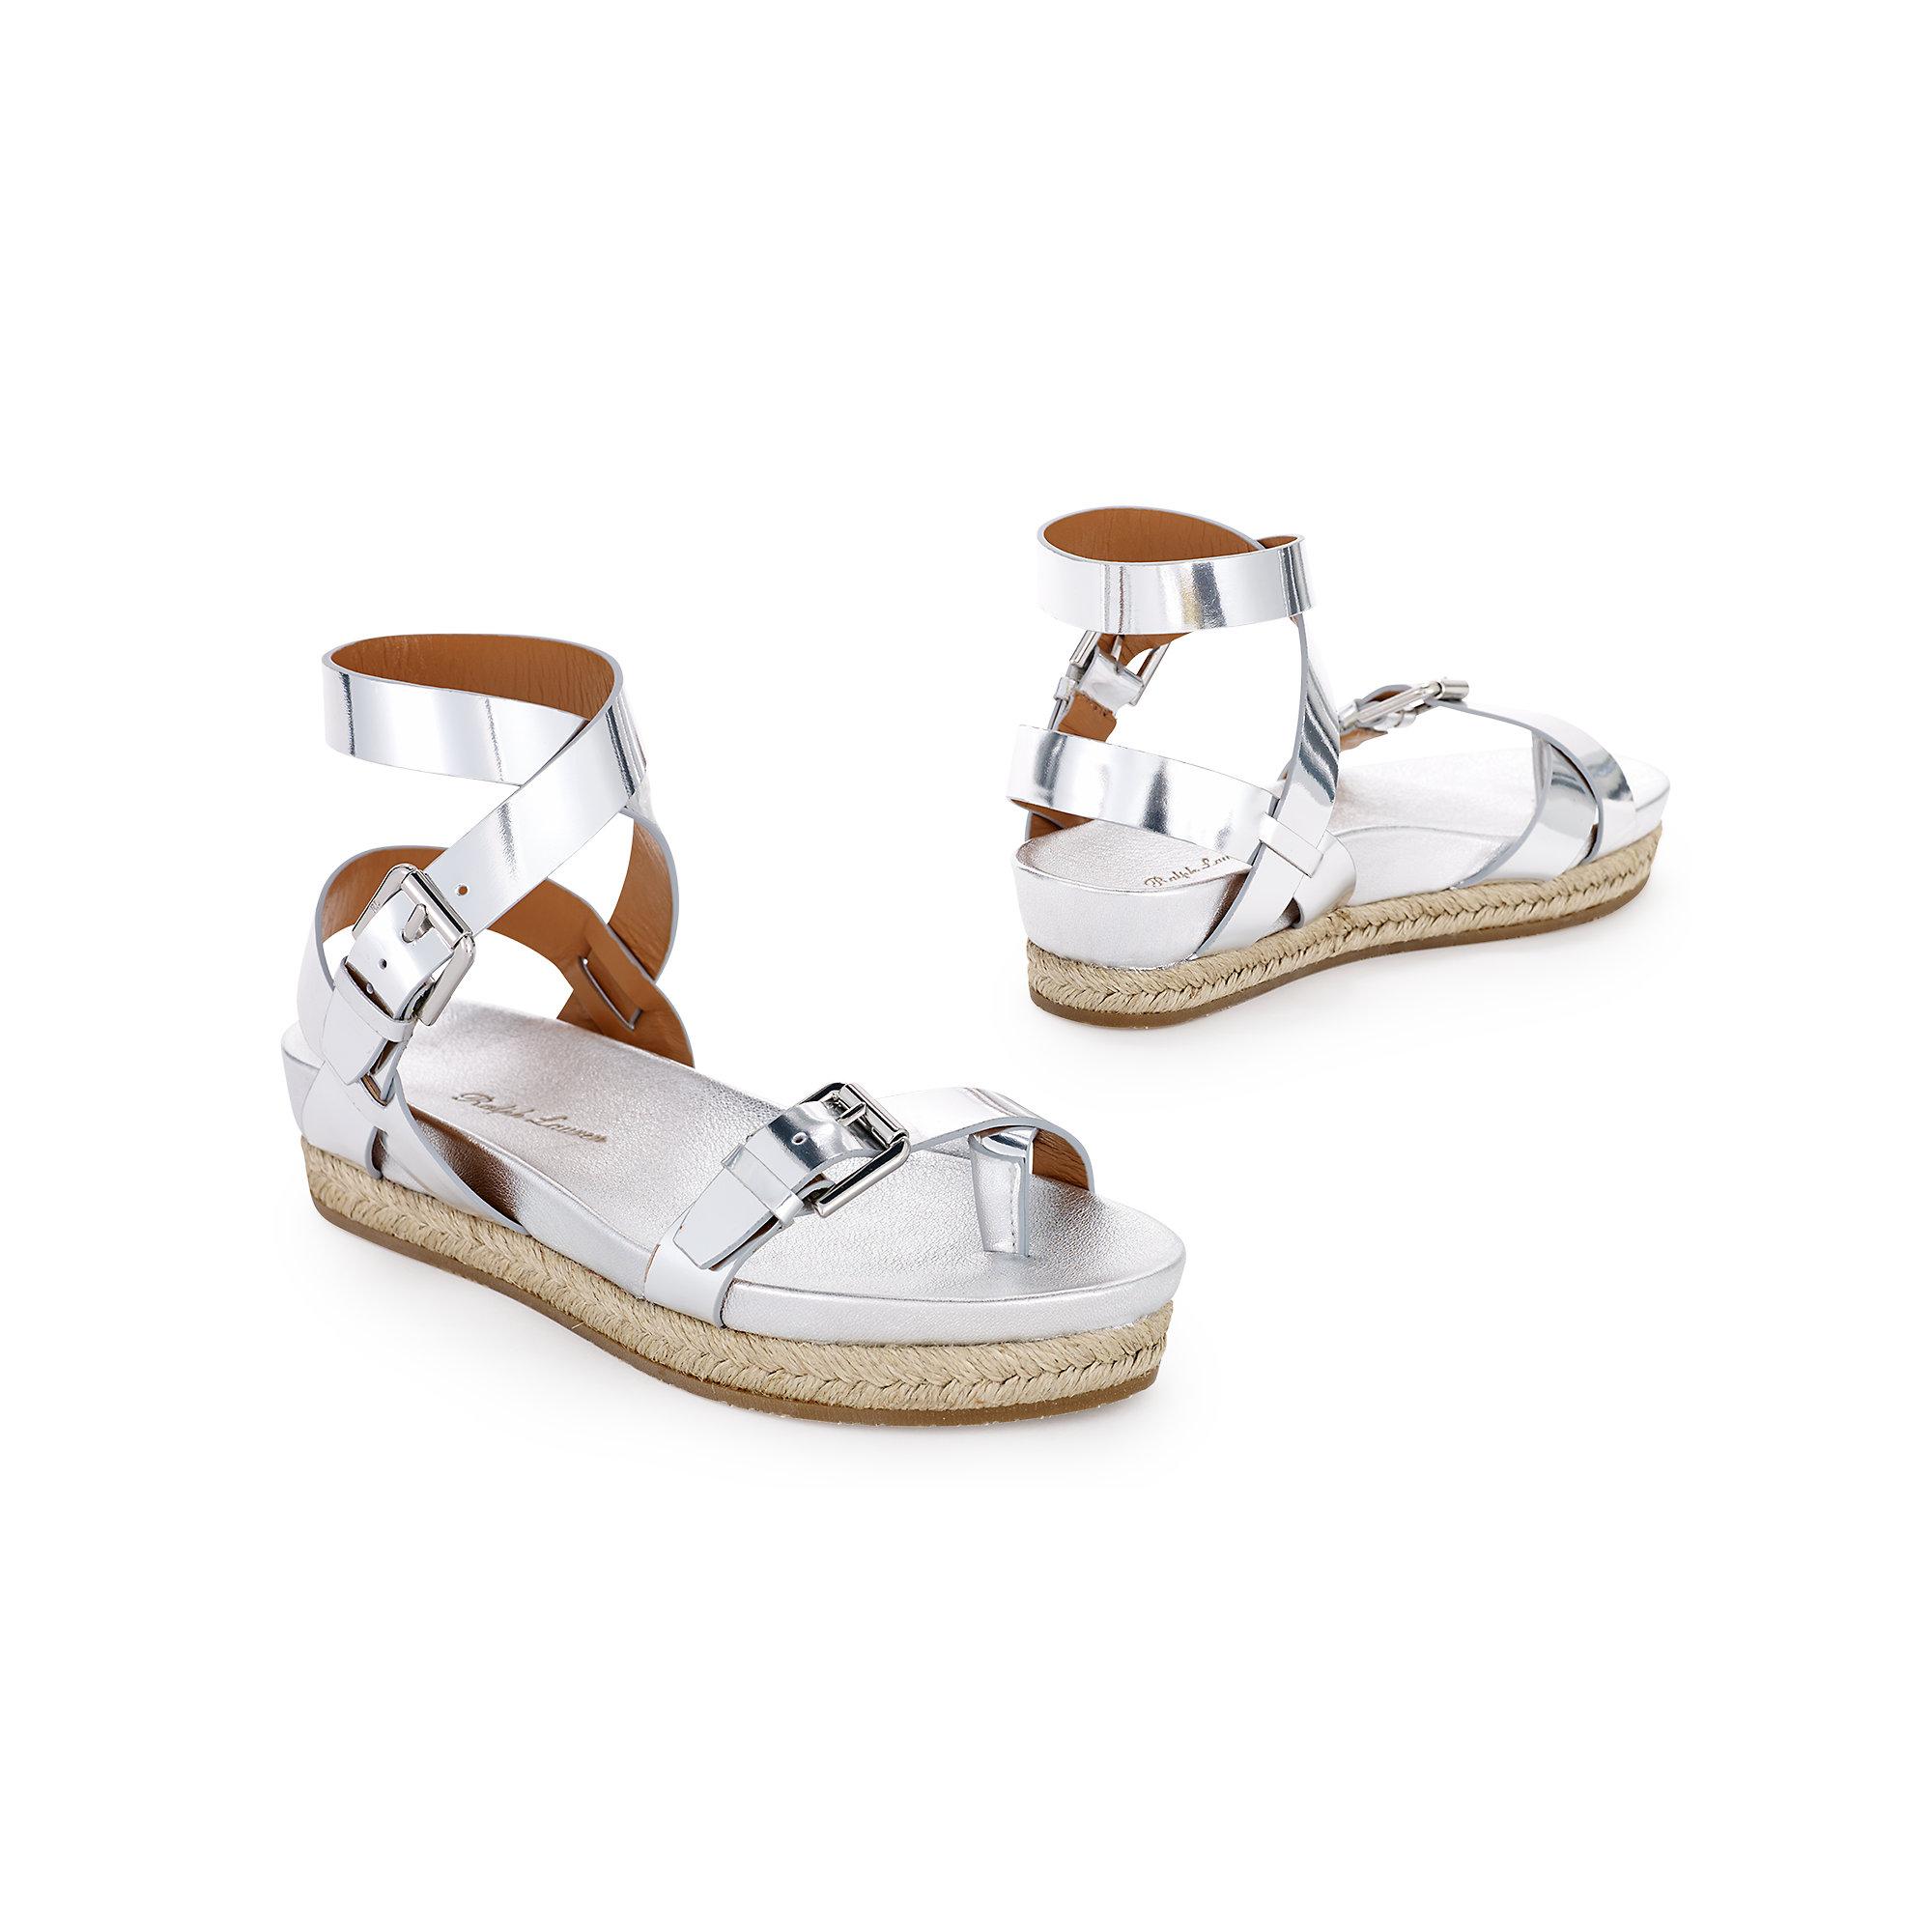 b266b15a5 Lyst - Ralph Lauren Specchio Raina Flat Sandal in Metallic